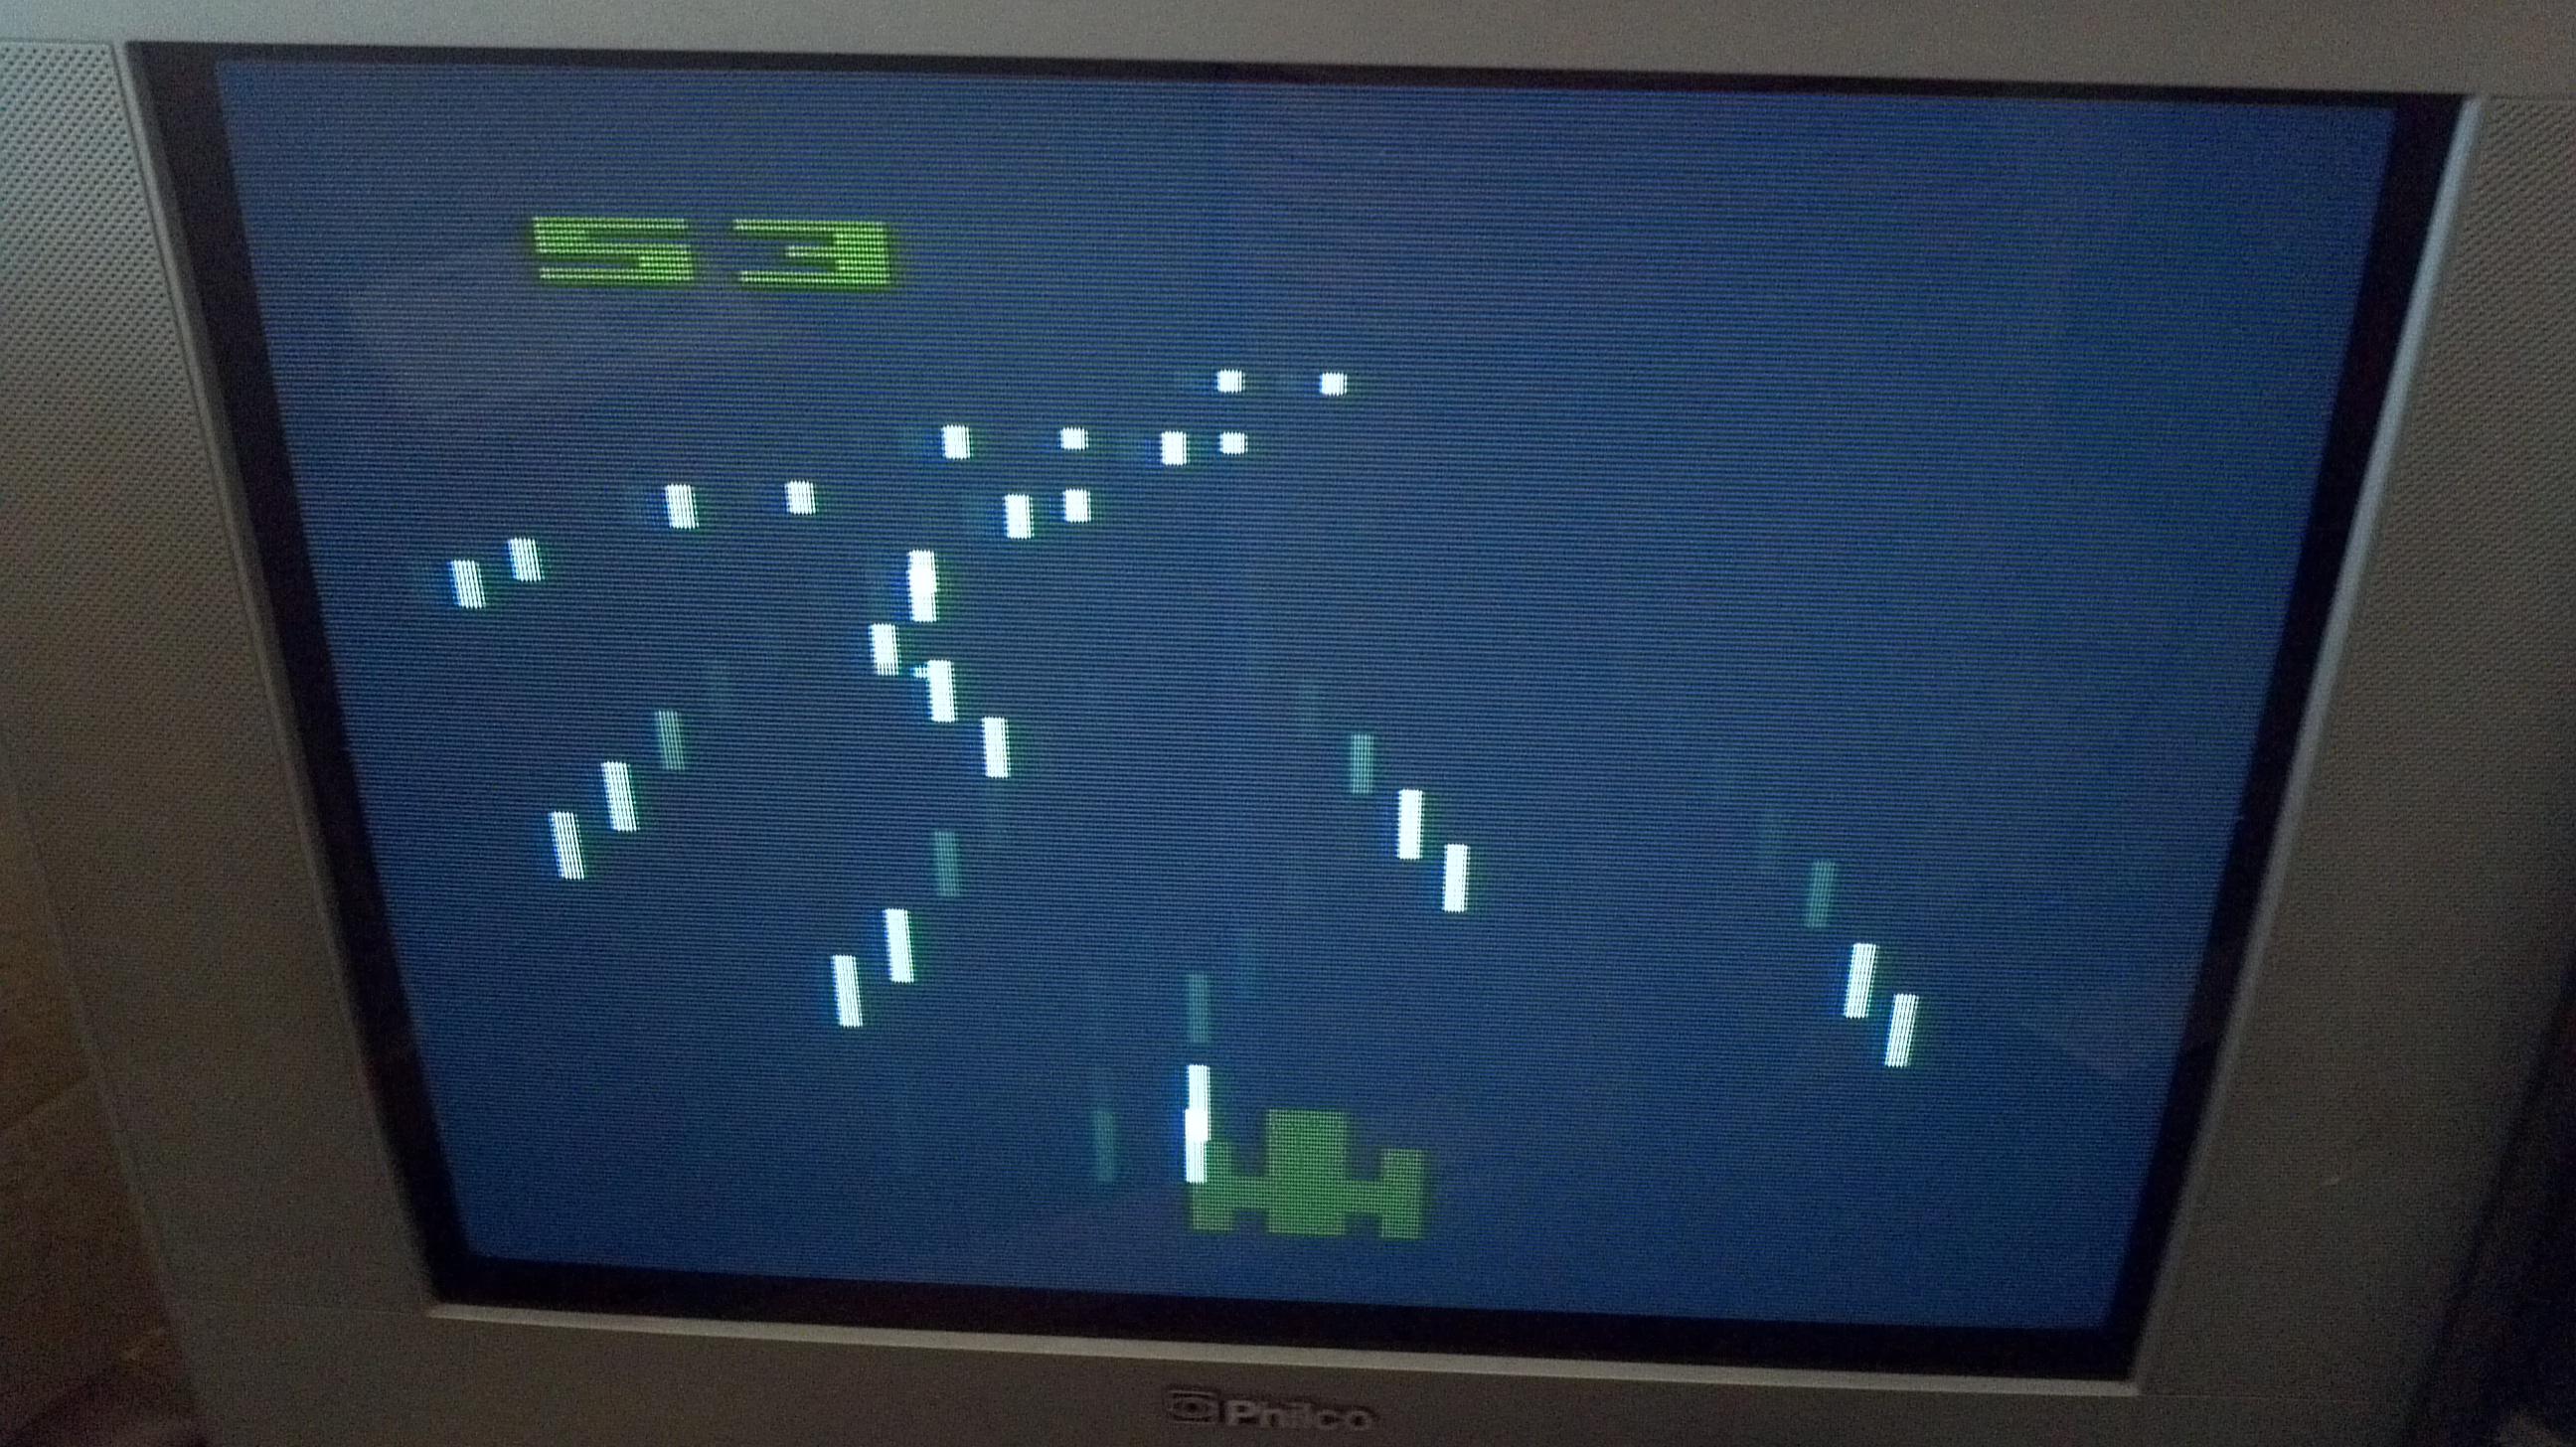 Liduario: Night Driver (Atari 2600 Novice/B) 53 points on 2014-05-29 07:30:23